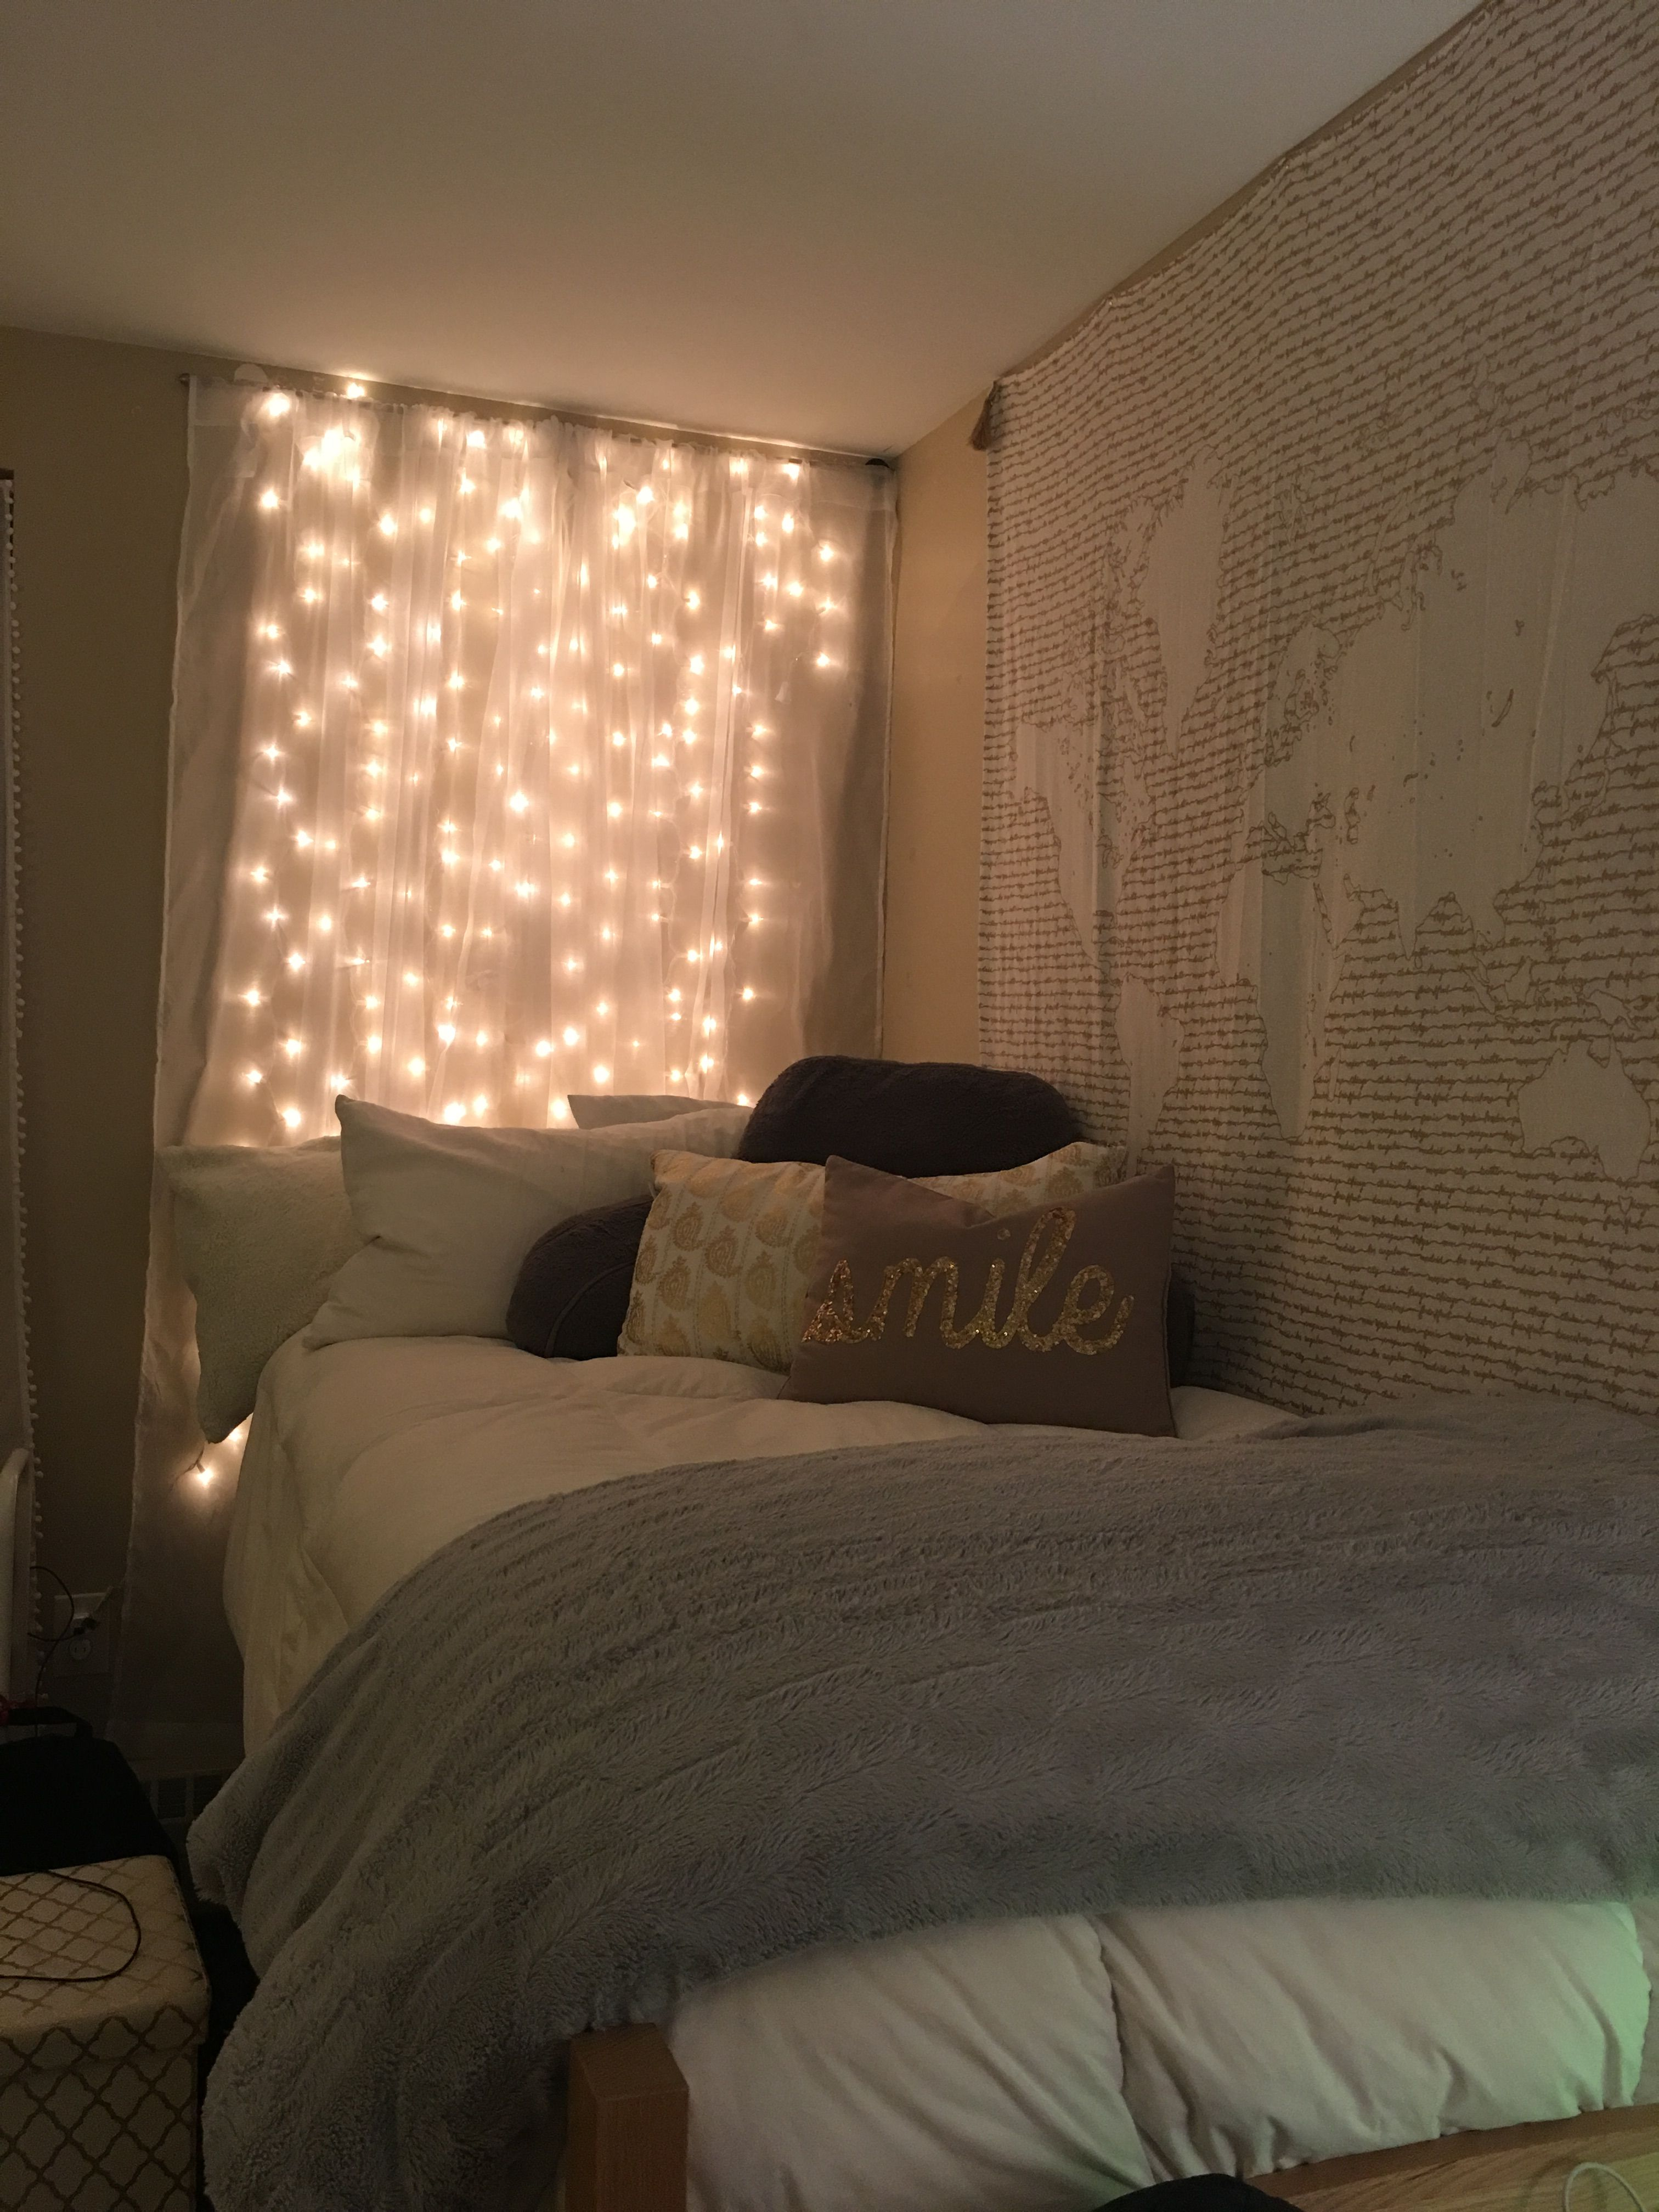 Student Dorm Room: Cozy College Dorm #cozy #college #dormroom